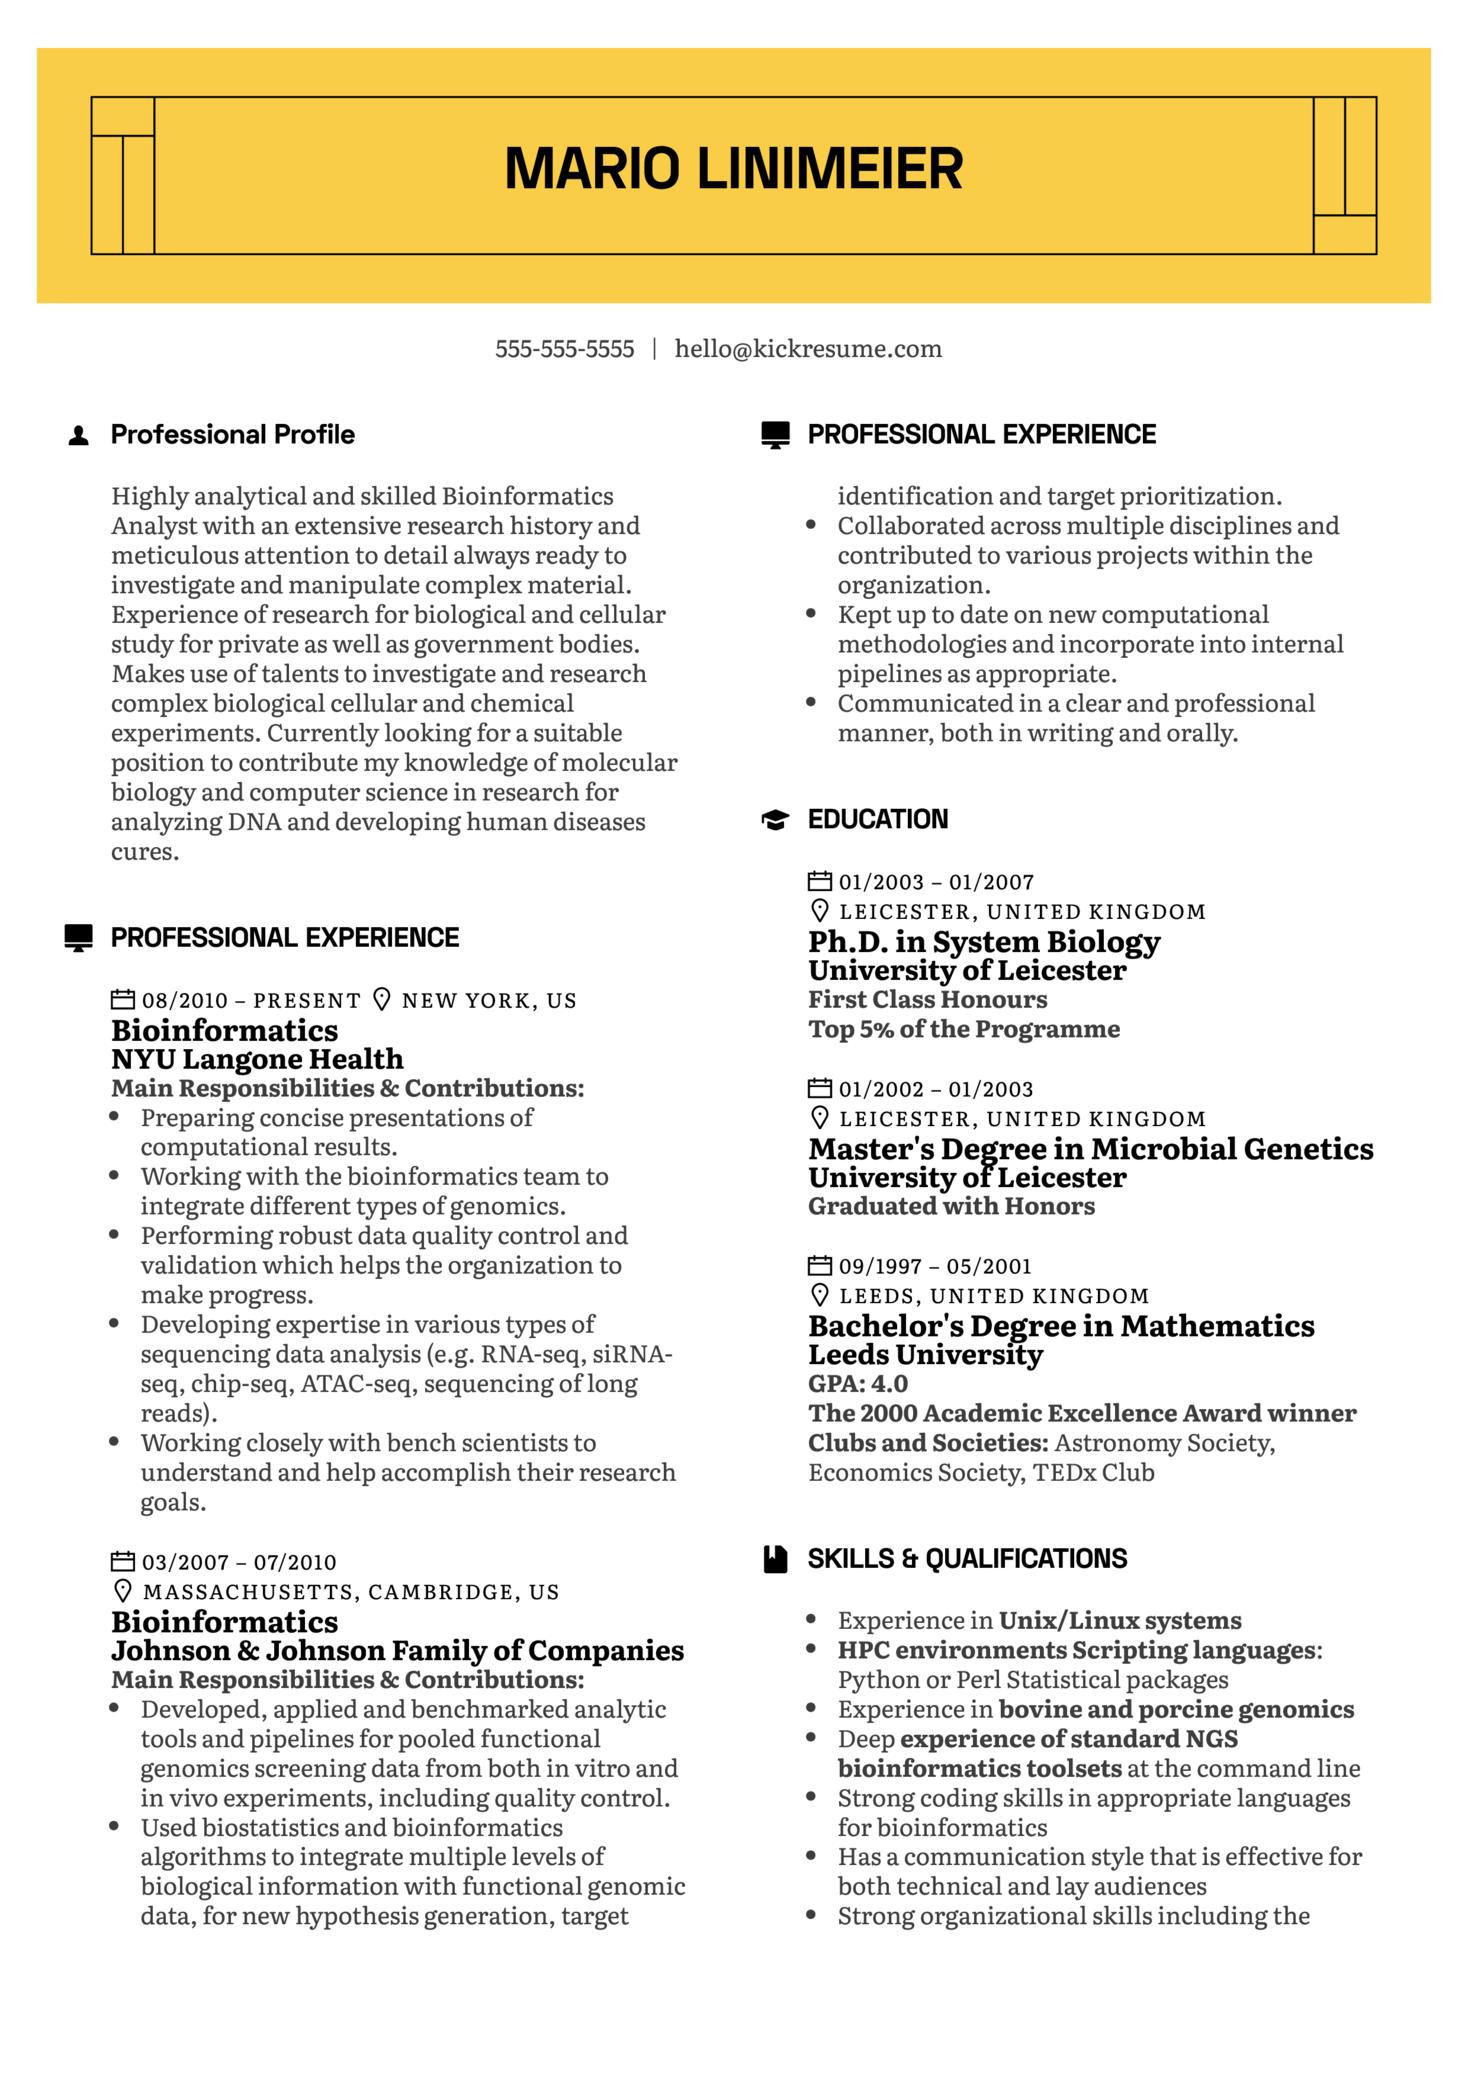 Bioinformatics Resume Example (parte 1)